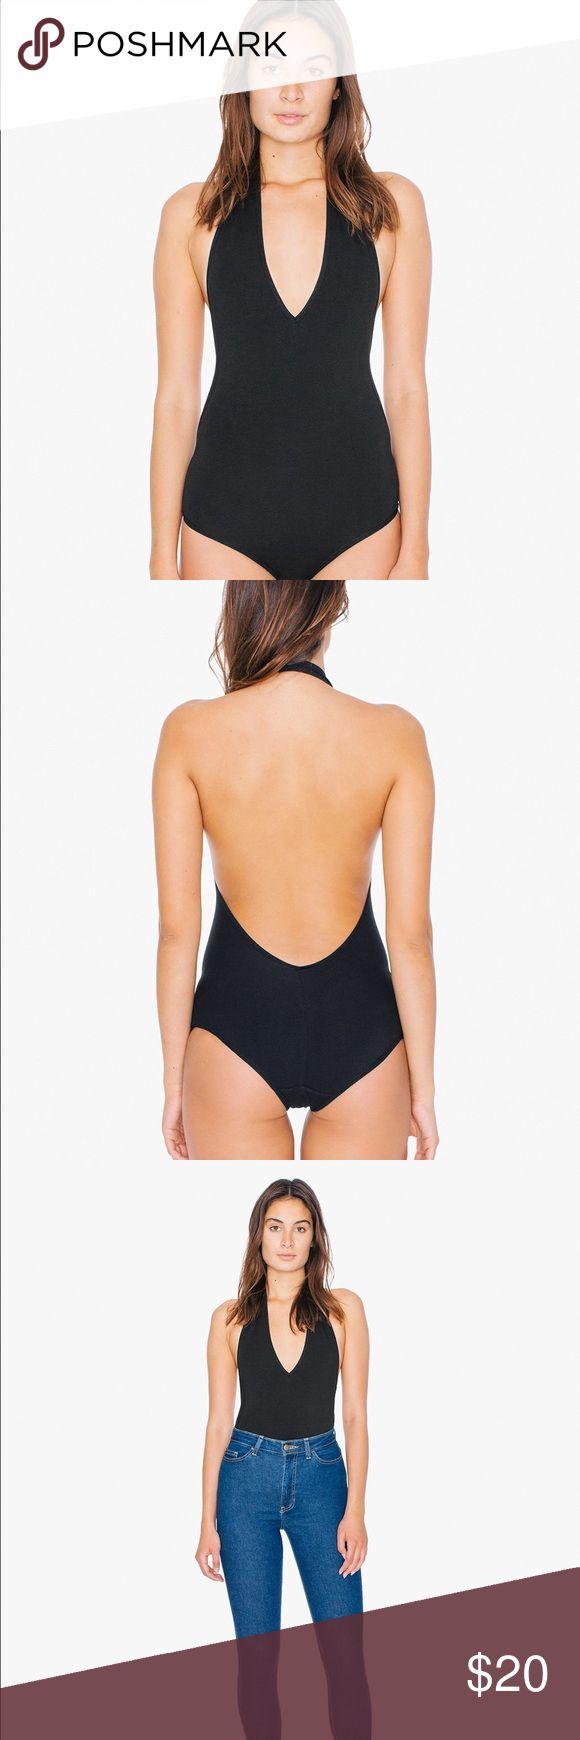 American Apparel V-neck halter bodysuit 👯 American Apparel V-neck halter bodysuit. Cotton/spandex. Only worn once. American Apparel Tops